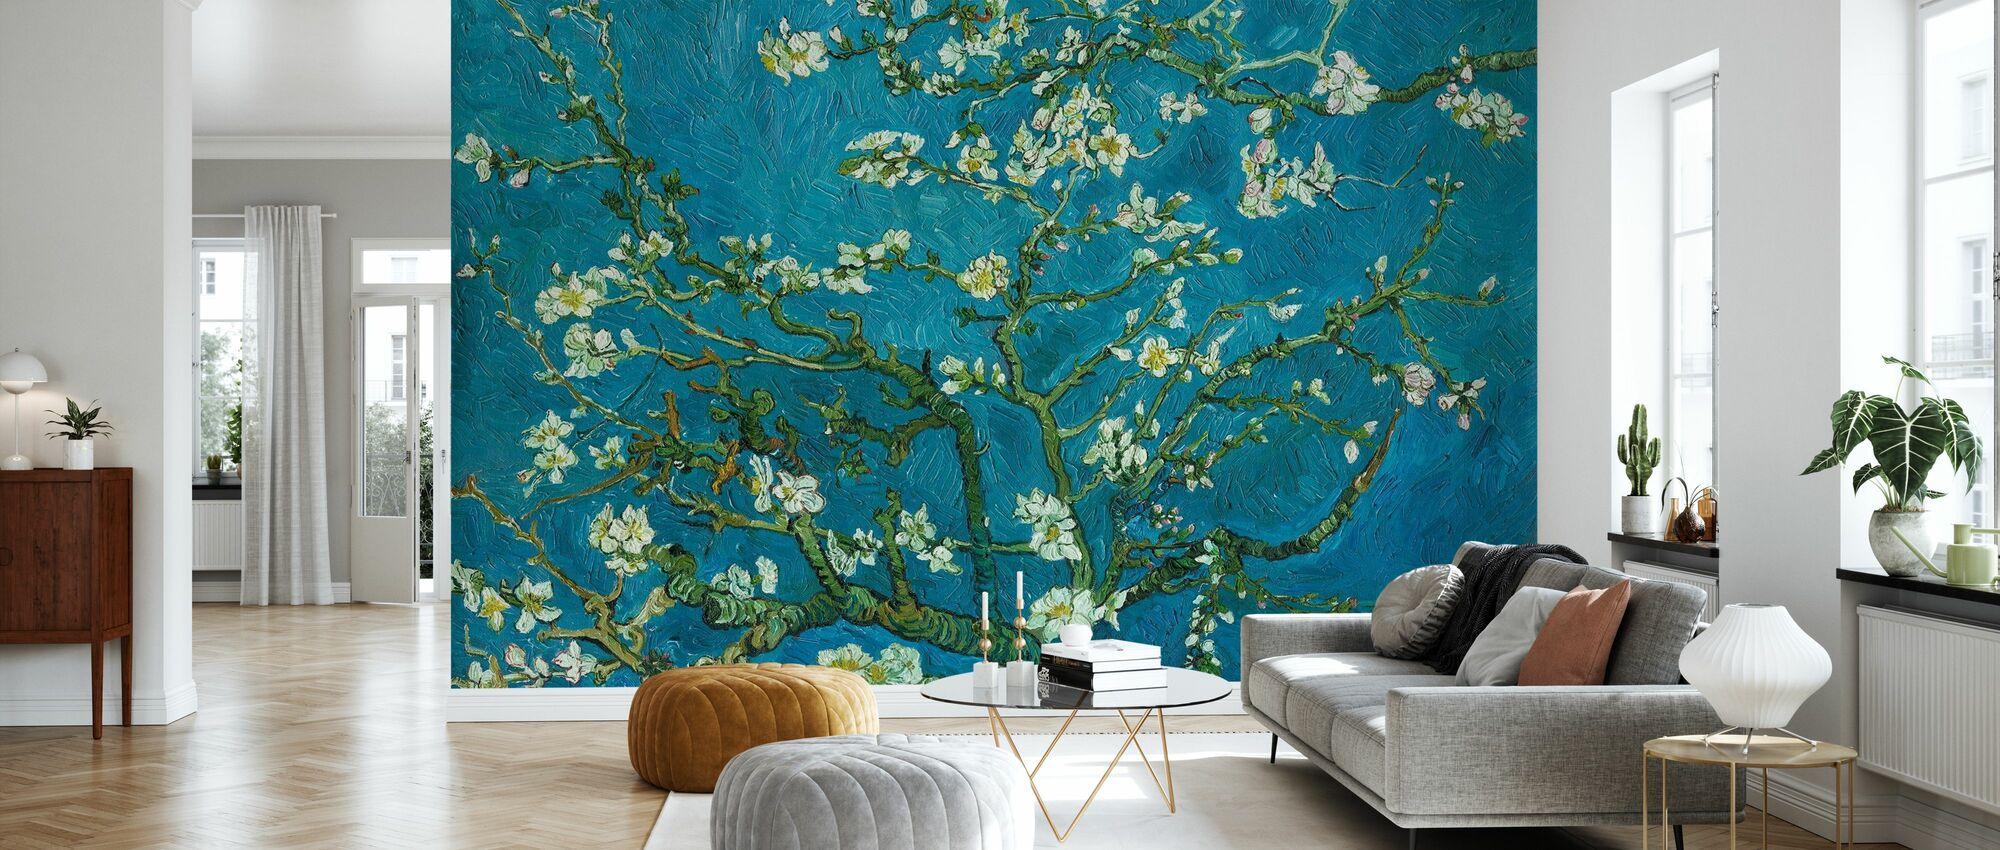 Almond Blossom - Wallpaper - Living Room